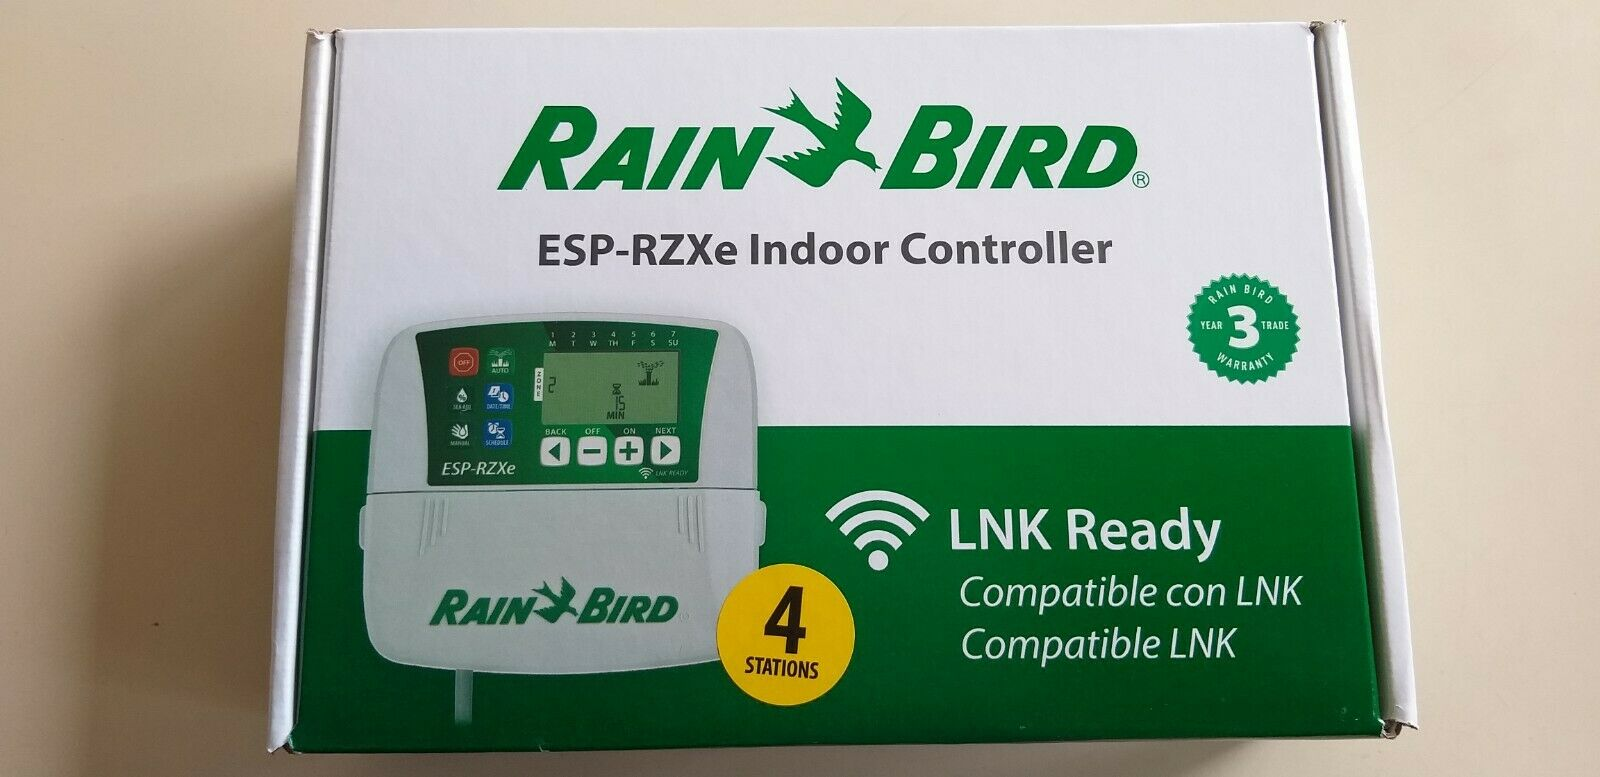 Programmatore centralina Rain Bird ESP - RZXE4I 4 stazioni compatibile lnk wifi